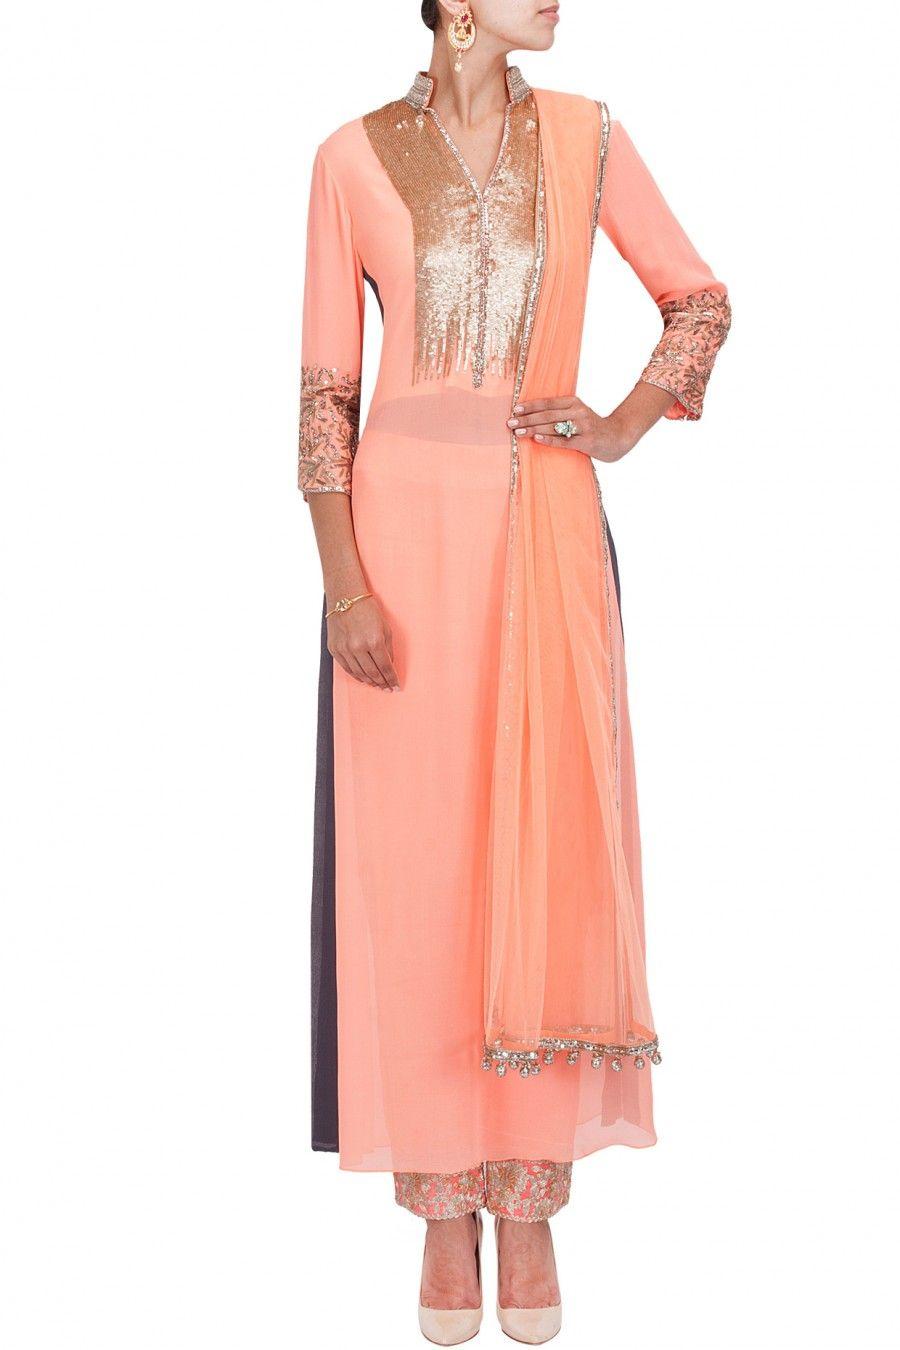 Fashion Designing Courses in Karachi Pakistan - kitaab